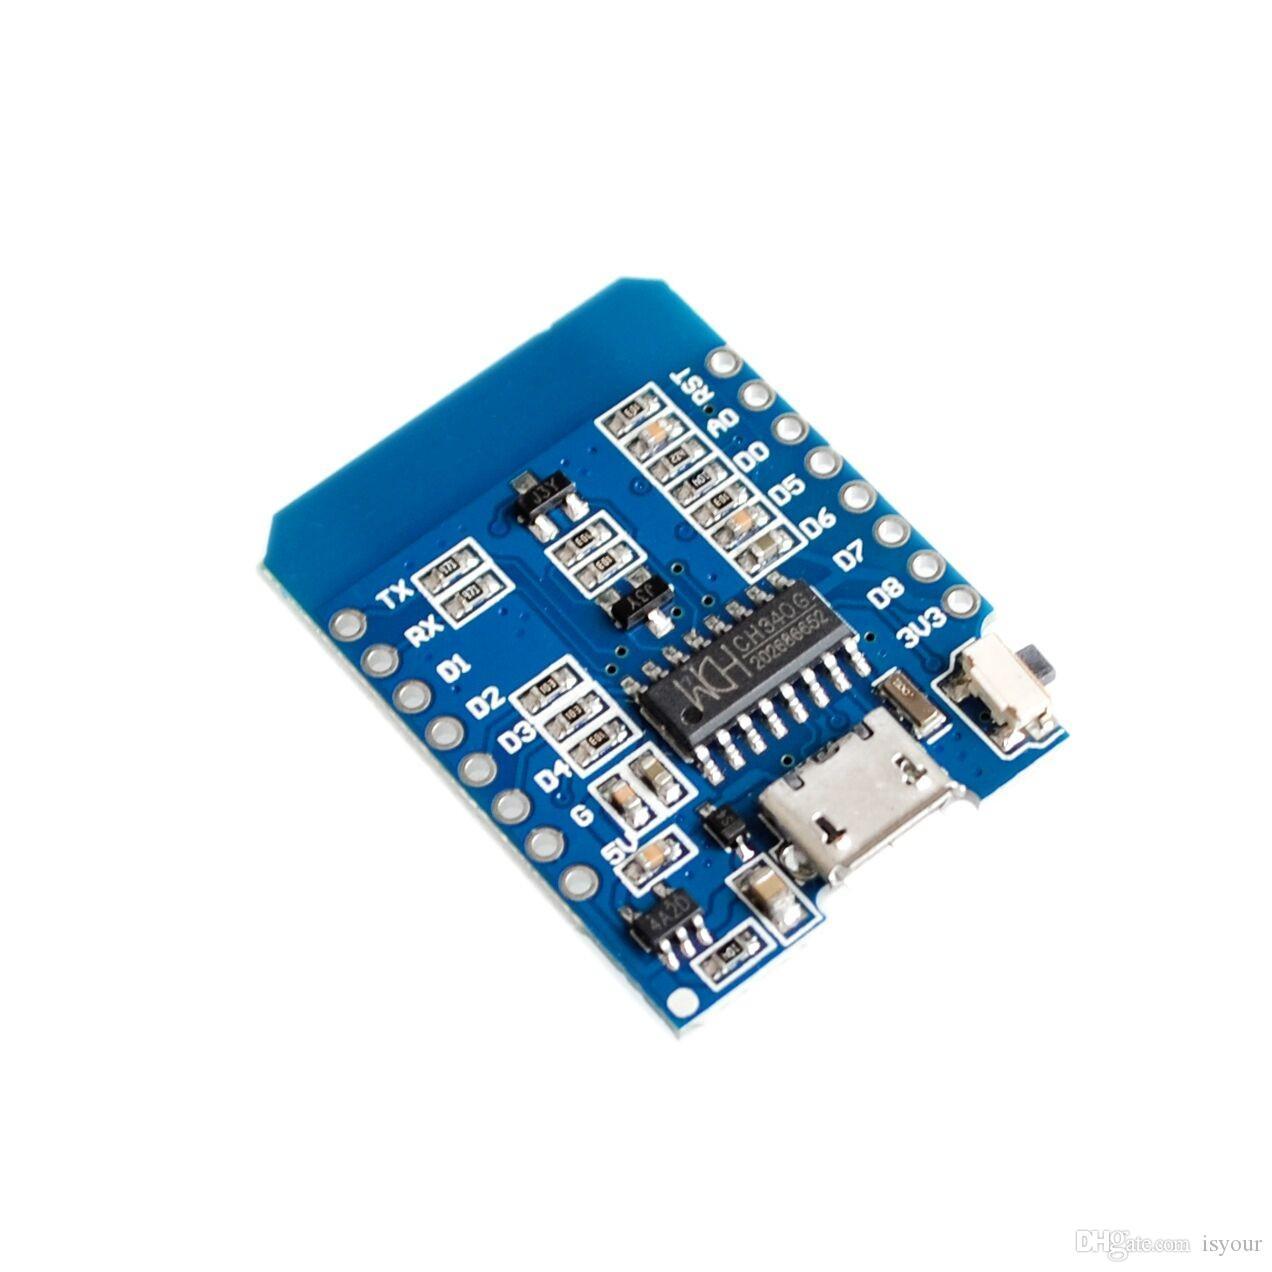 Freeshipping 10pcs D1 mini - Mini Node Mcu 4M bytes Lua WIFI Internet of Things development board based ESP8266